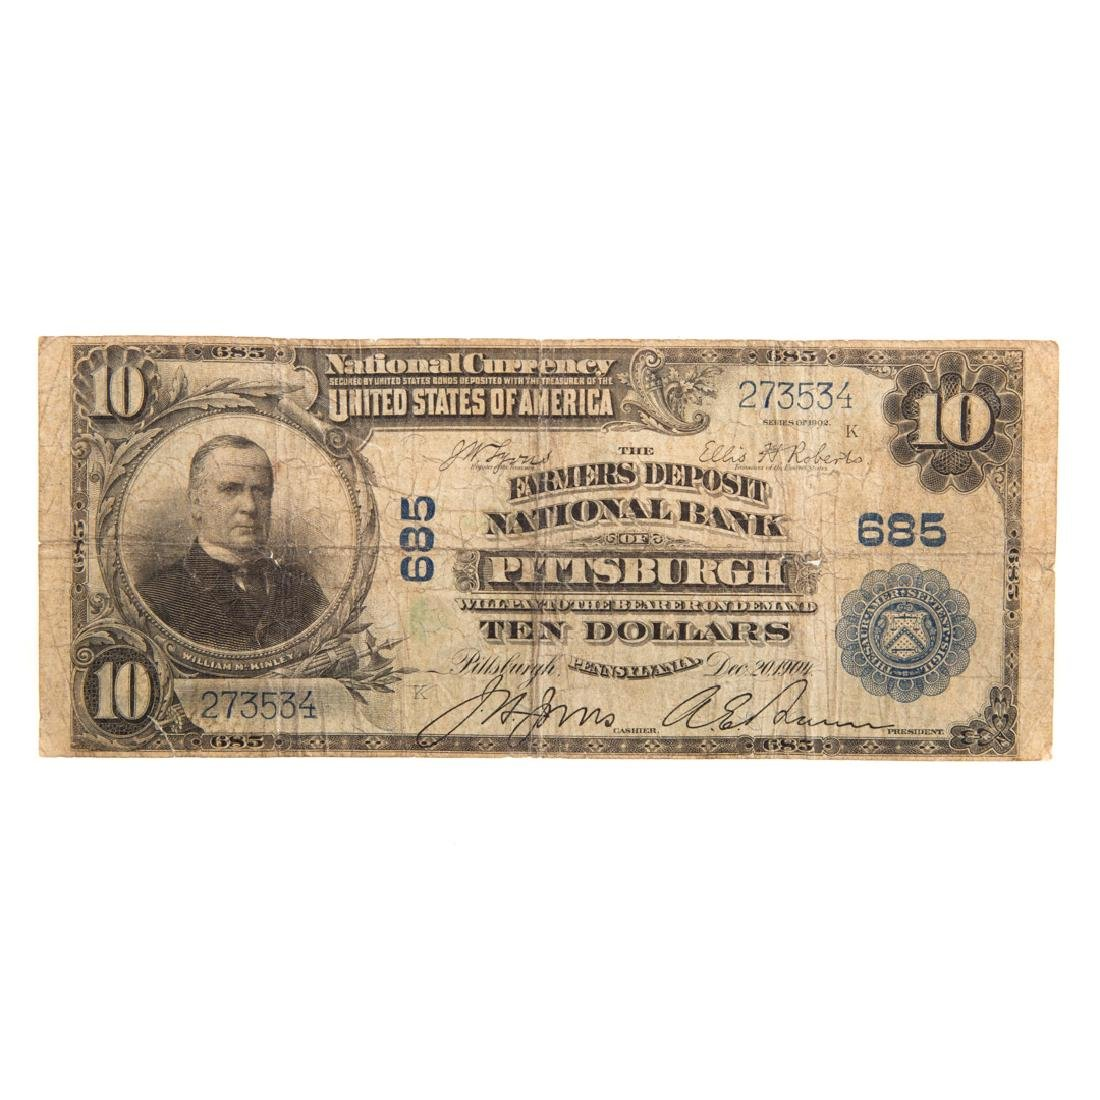 [US] $10 1902 Plain Back Ch#685 Fr-624